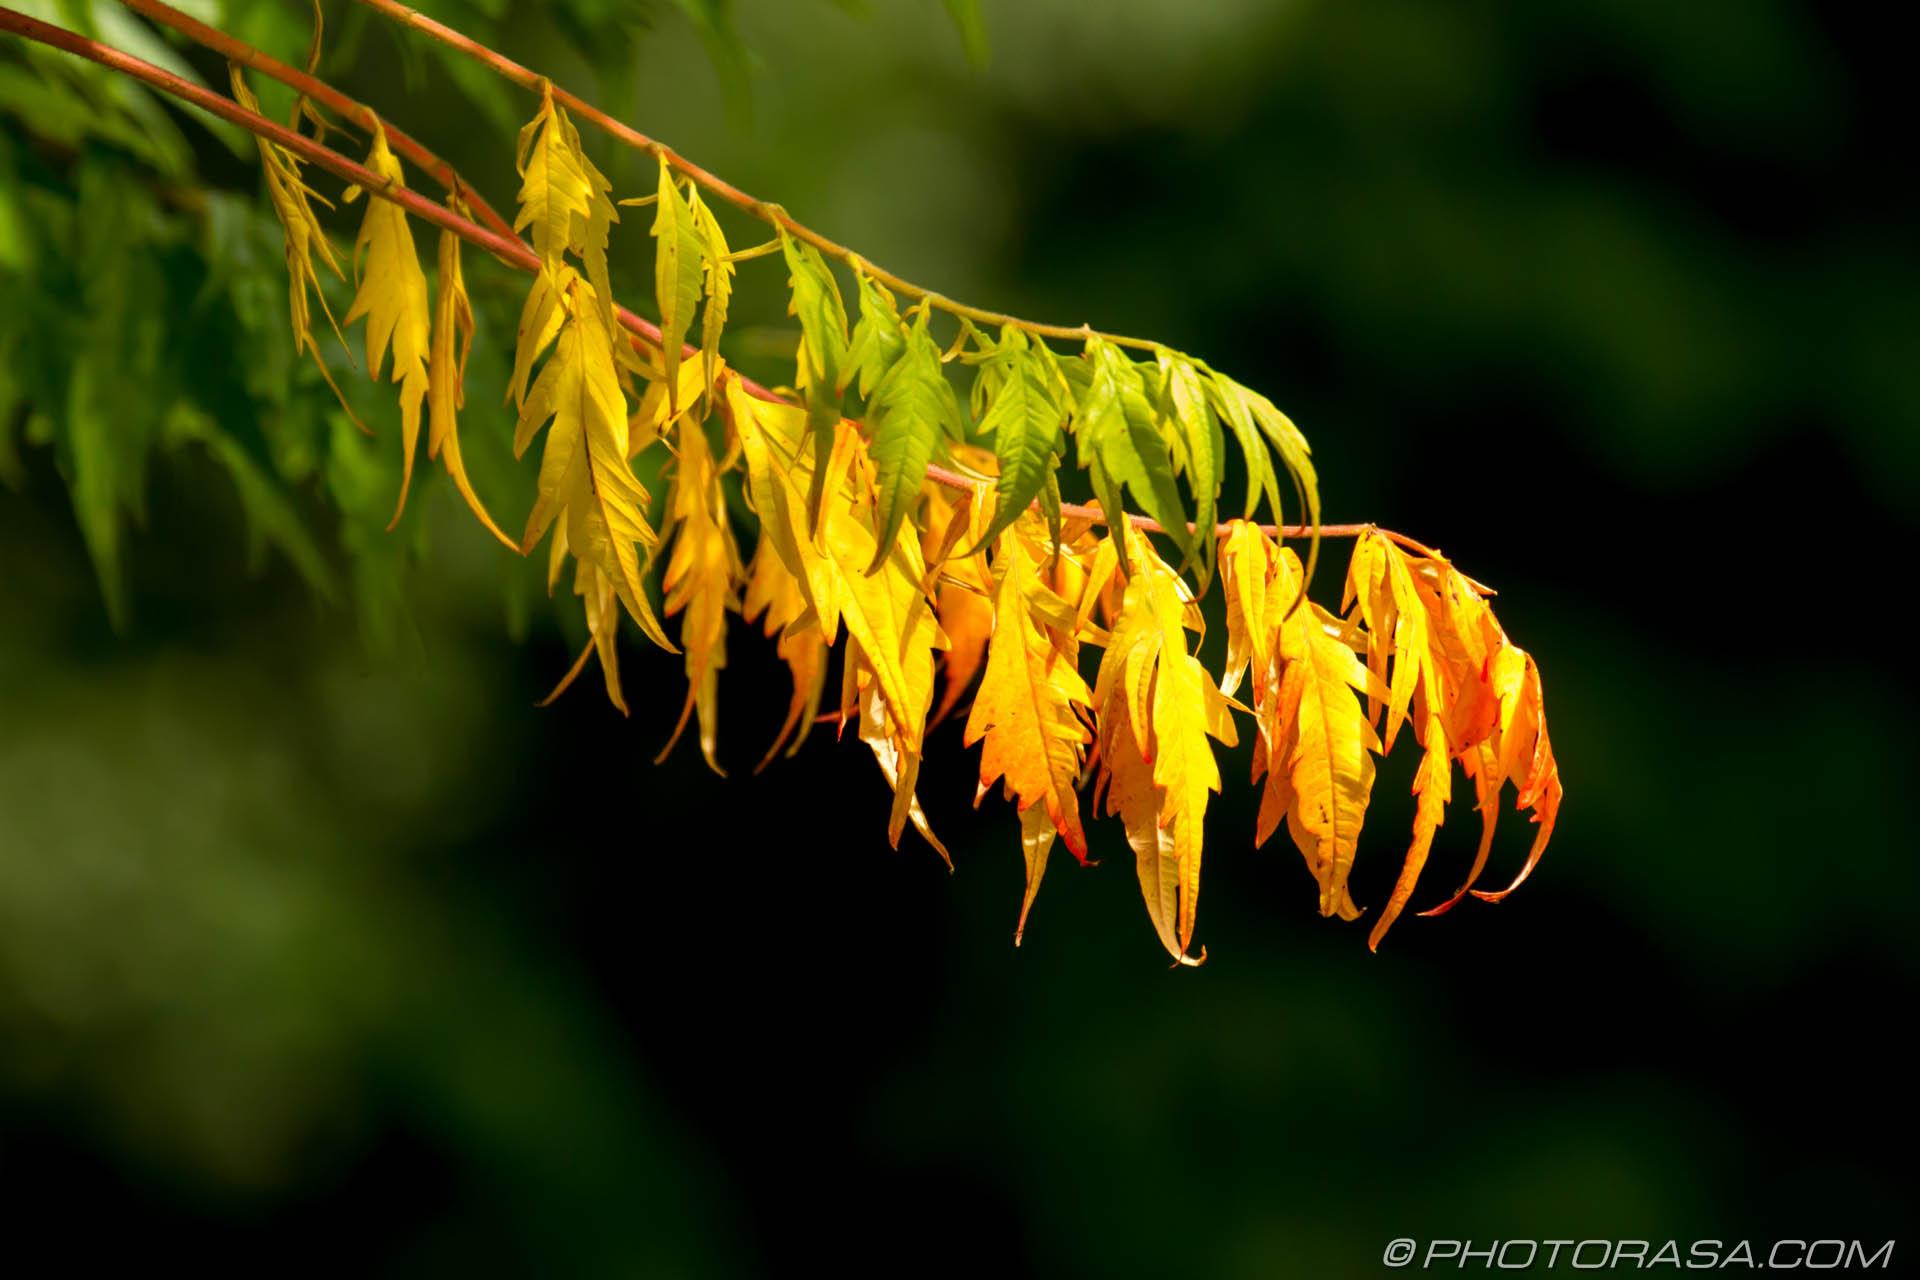 https://photorasa.com/leaves/yellow-leaves-in-low-sun/